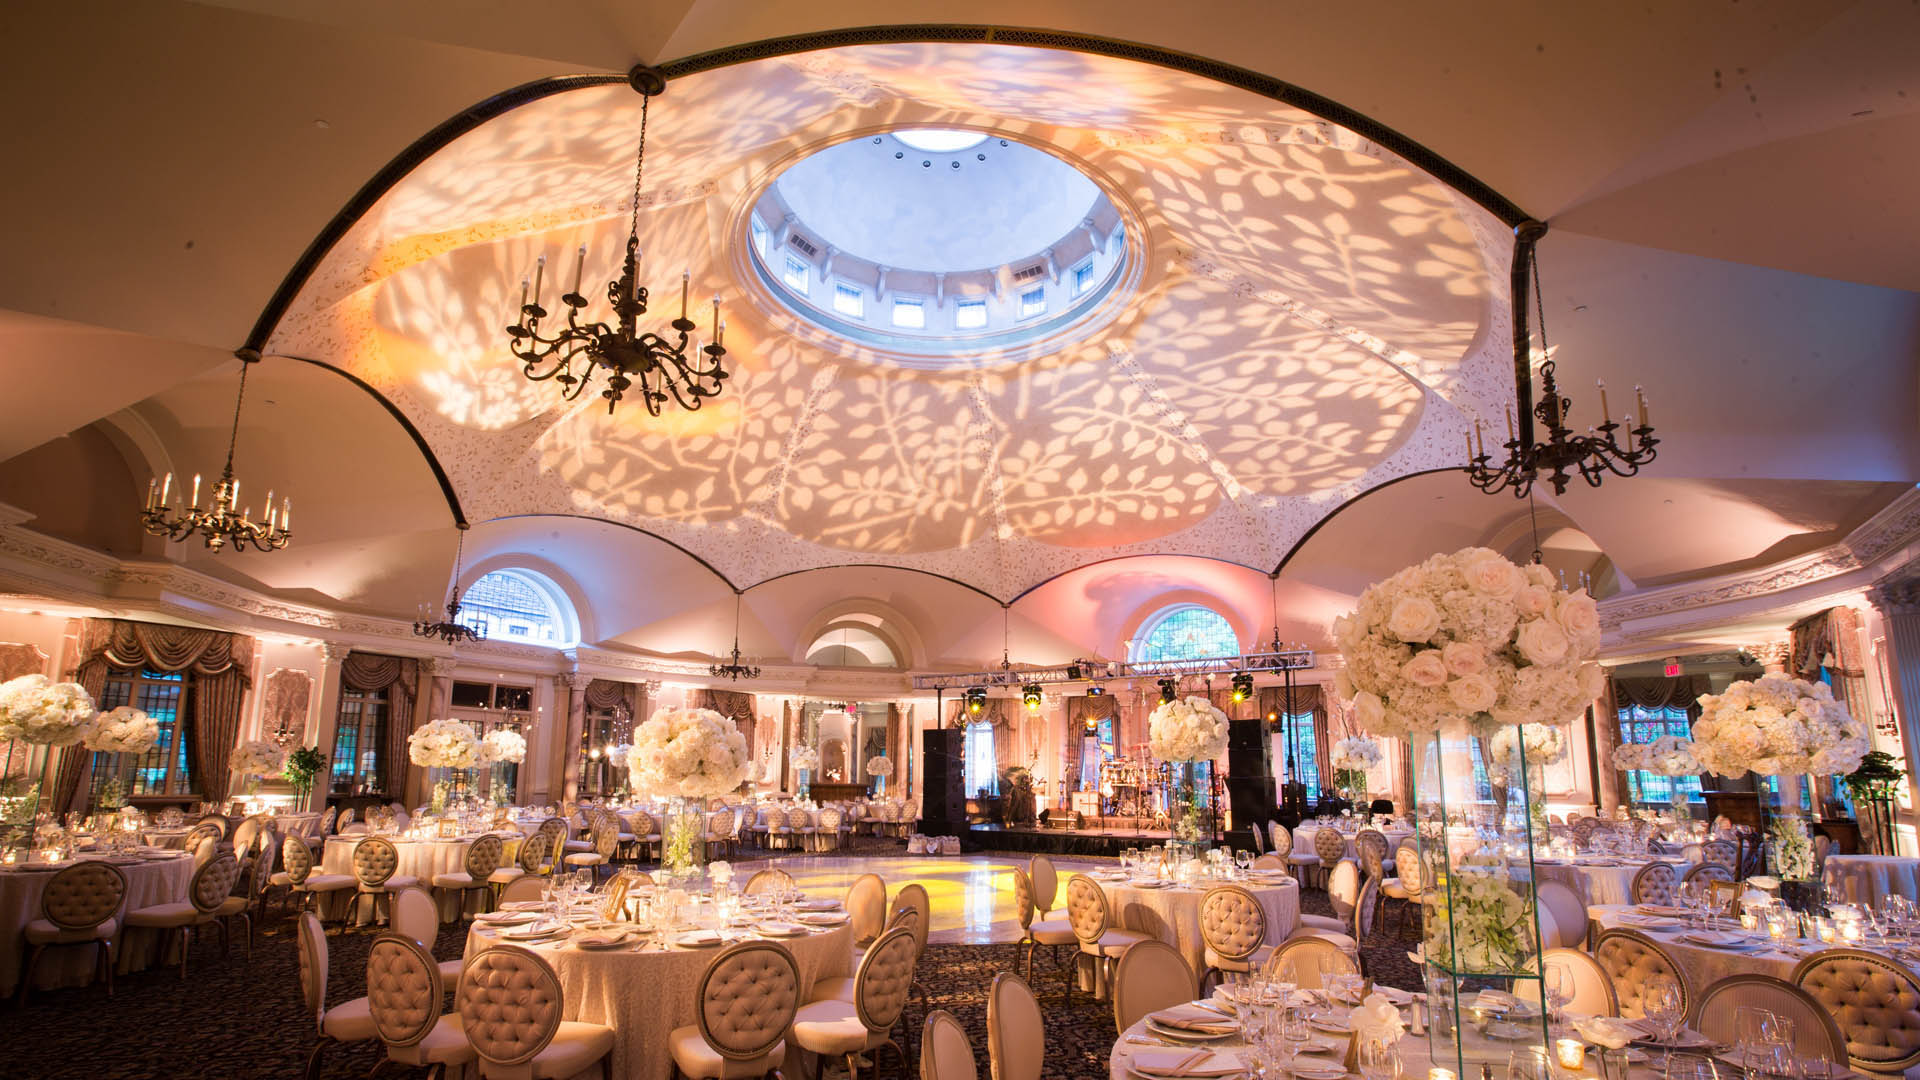 Wedding Receptions Venue Nj Pleasantdale Chateau